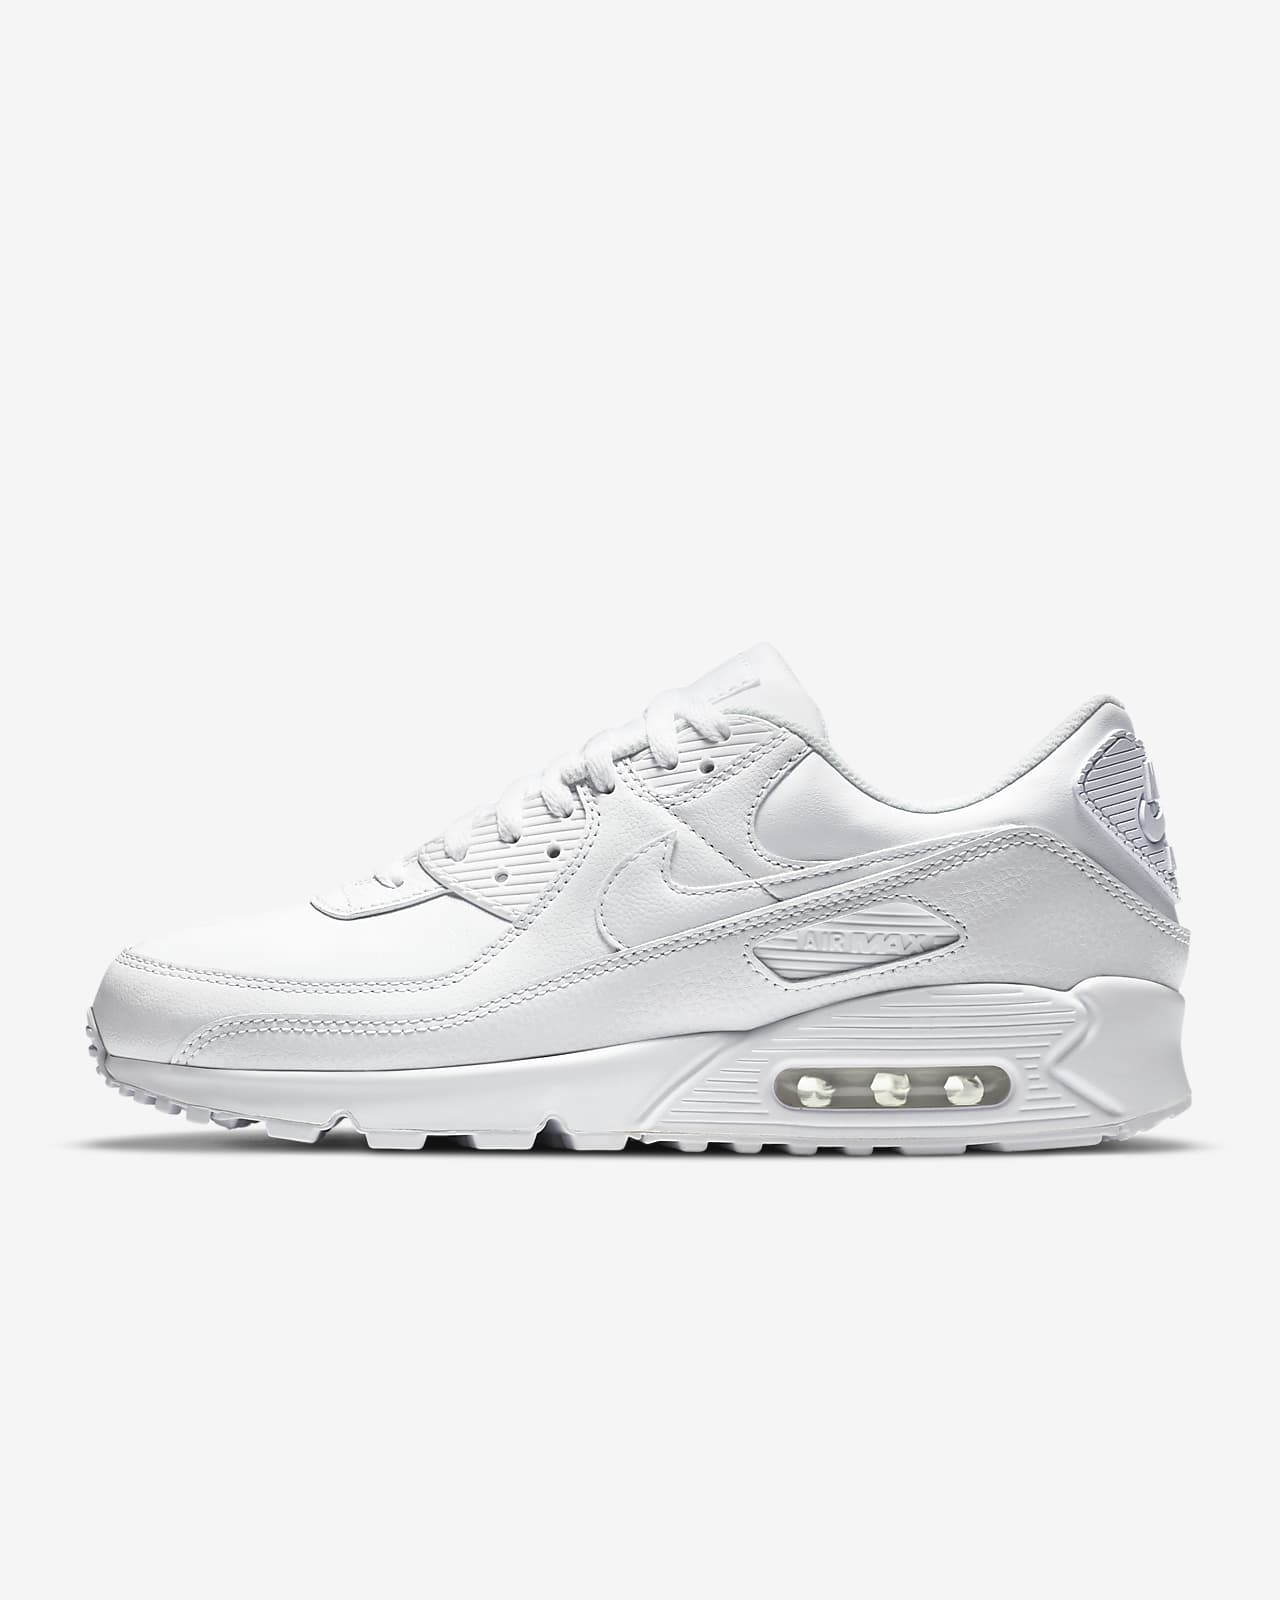 Air Max 90 LTR Men's Shoe